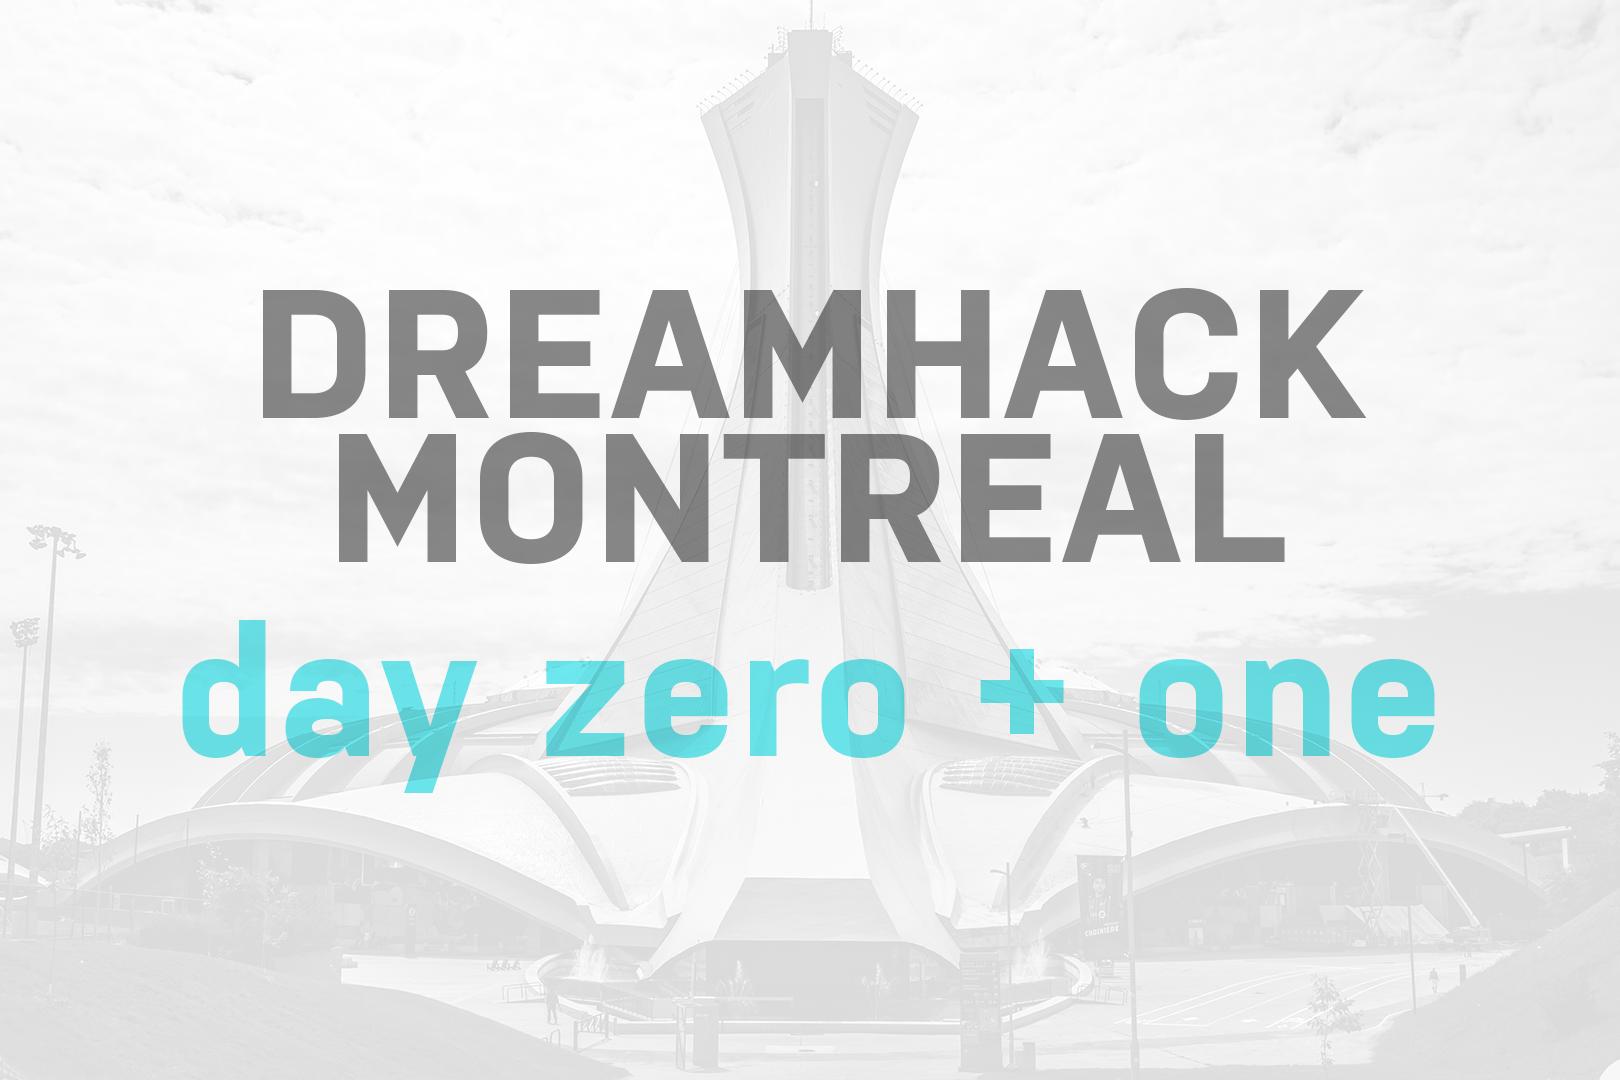 September 6th 2019, Montréal, Canada